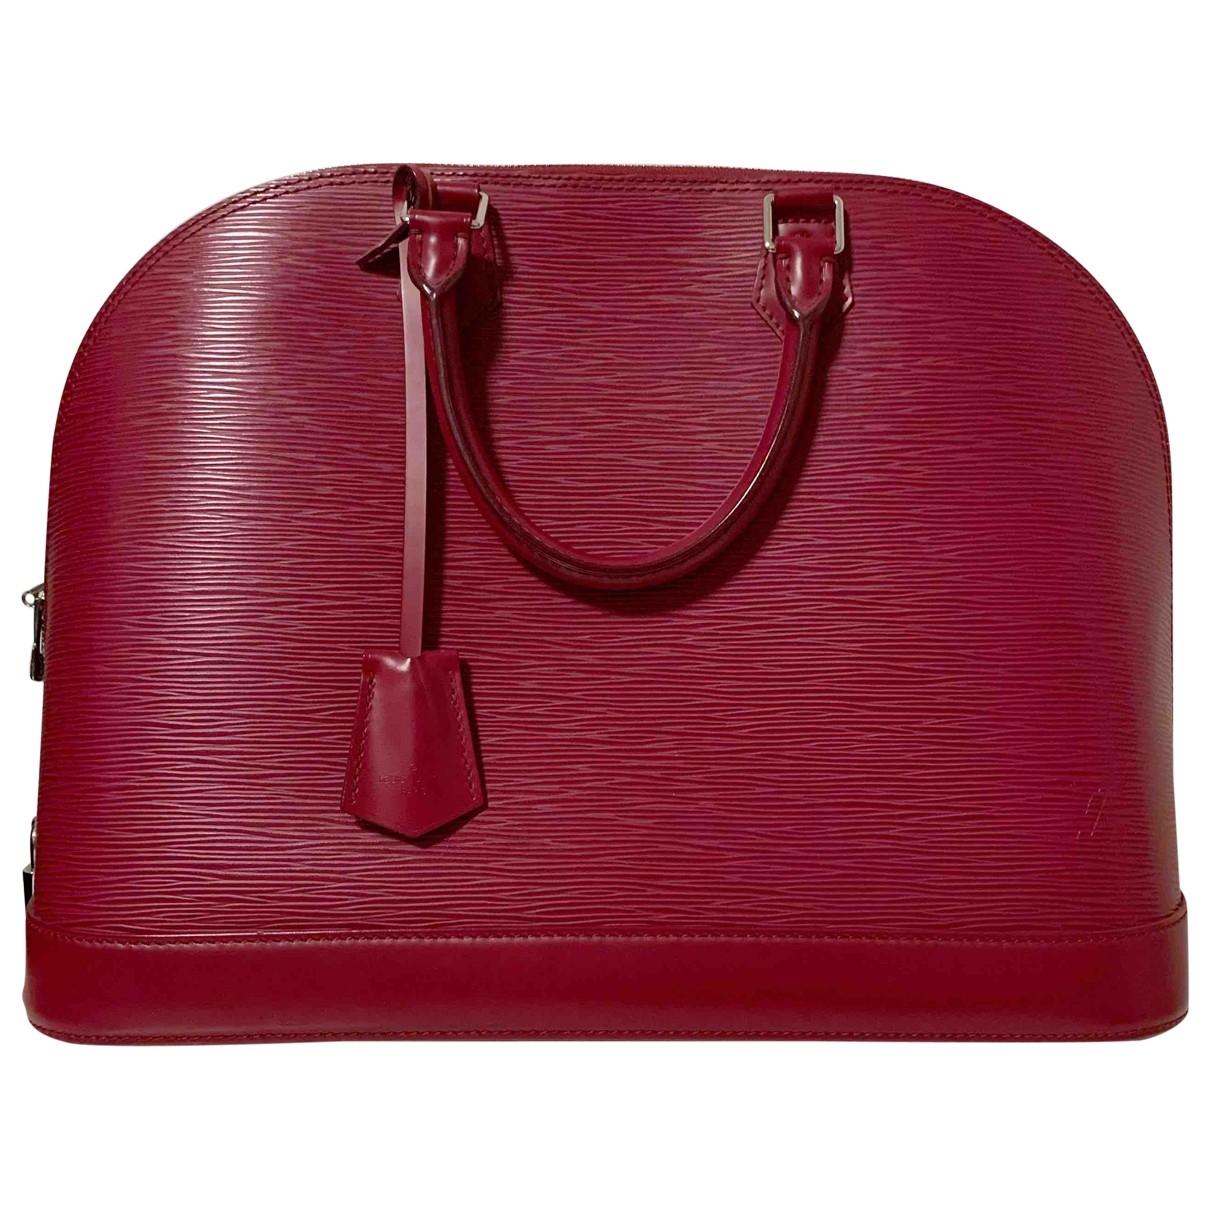 Louis Vuitton - Sac a main Alma pour femme en cuir - rose